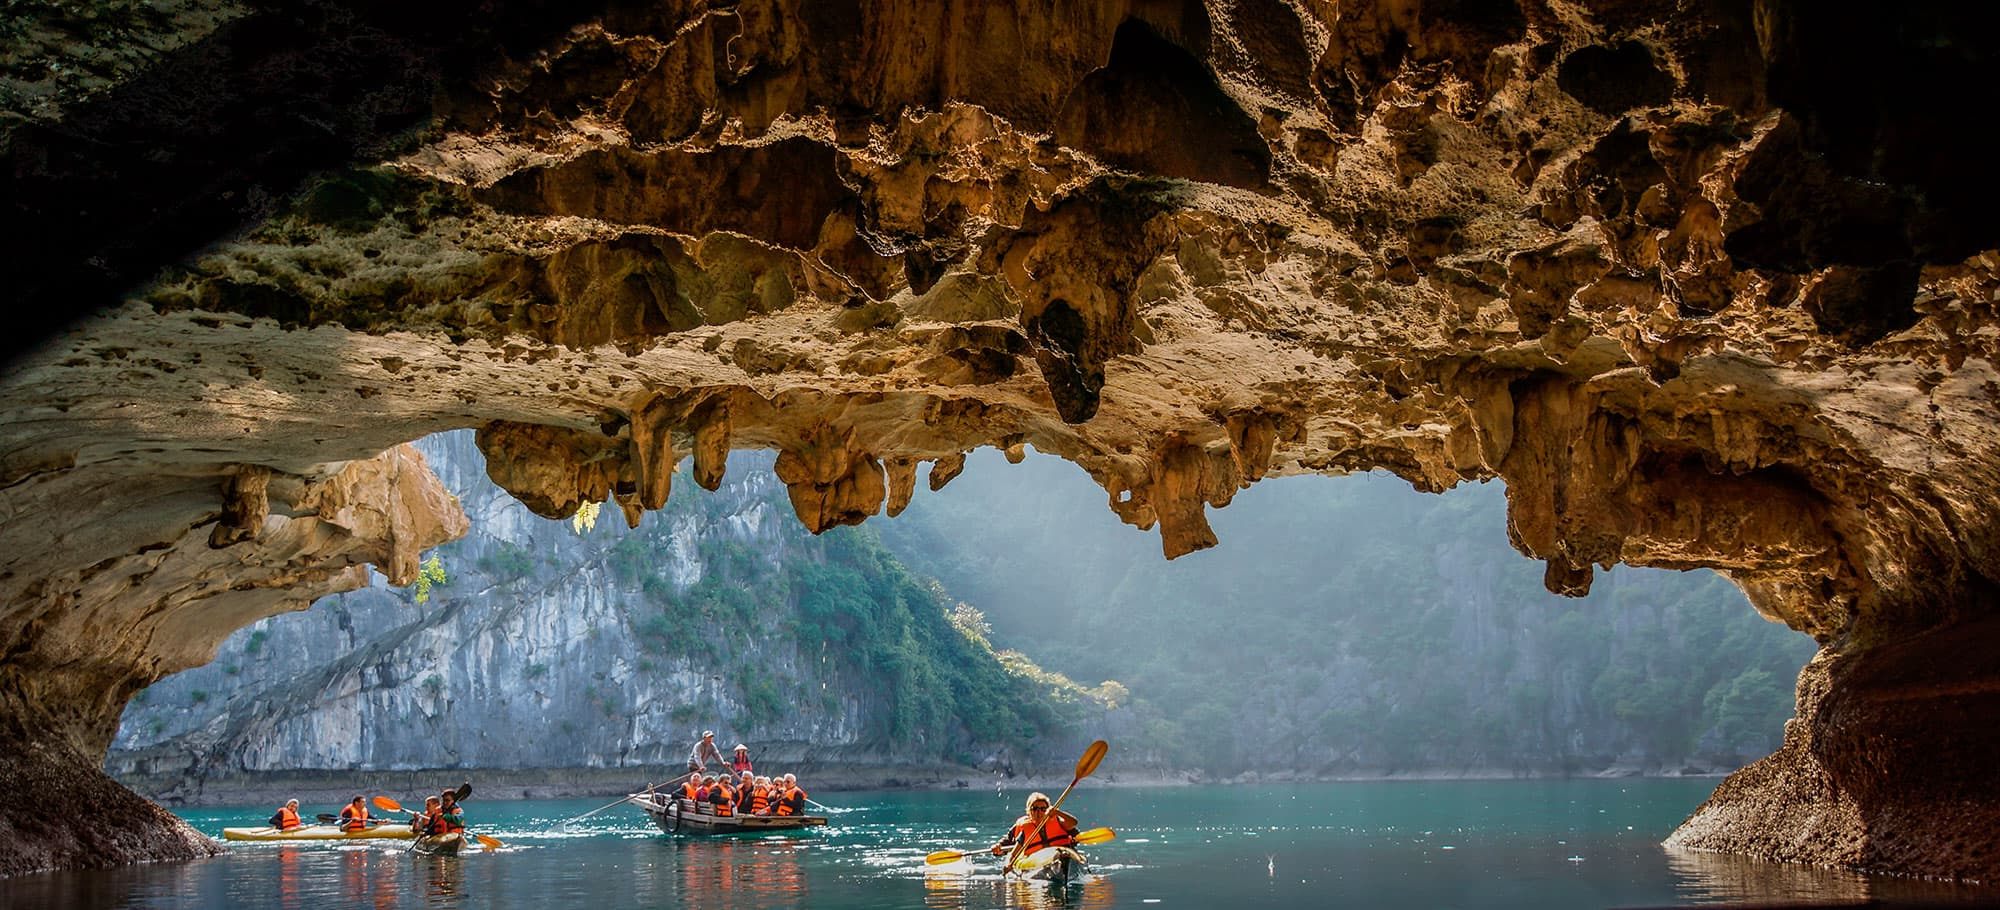 Vietnam y Camboya de lujo - Vietnam- imagen #4